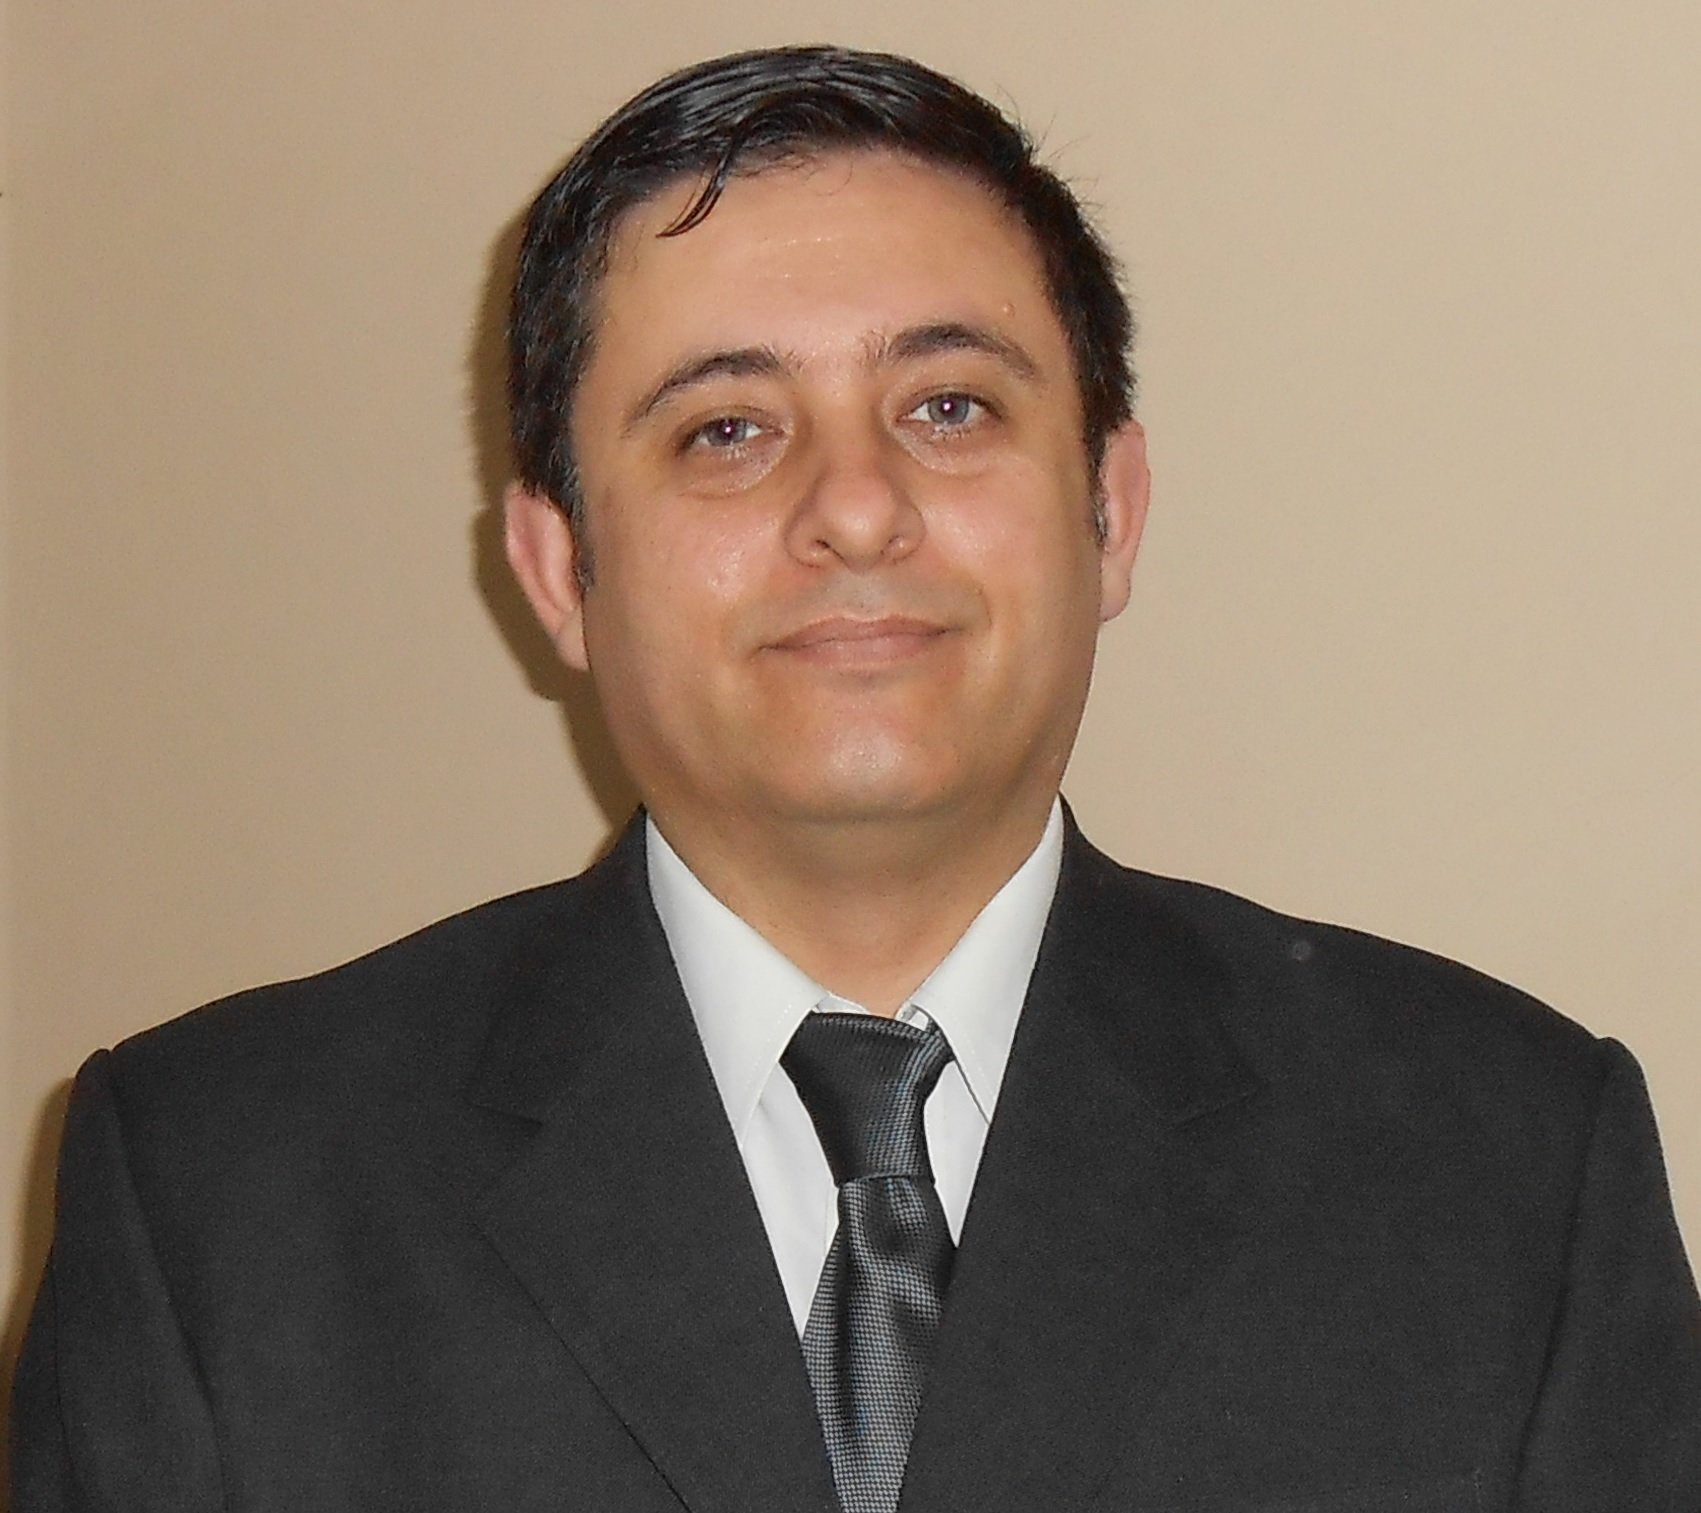 Masuell Alberto Martin